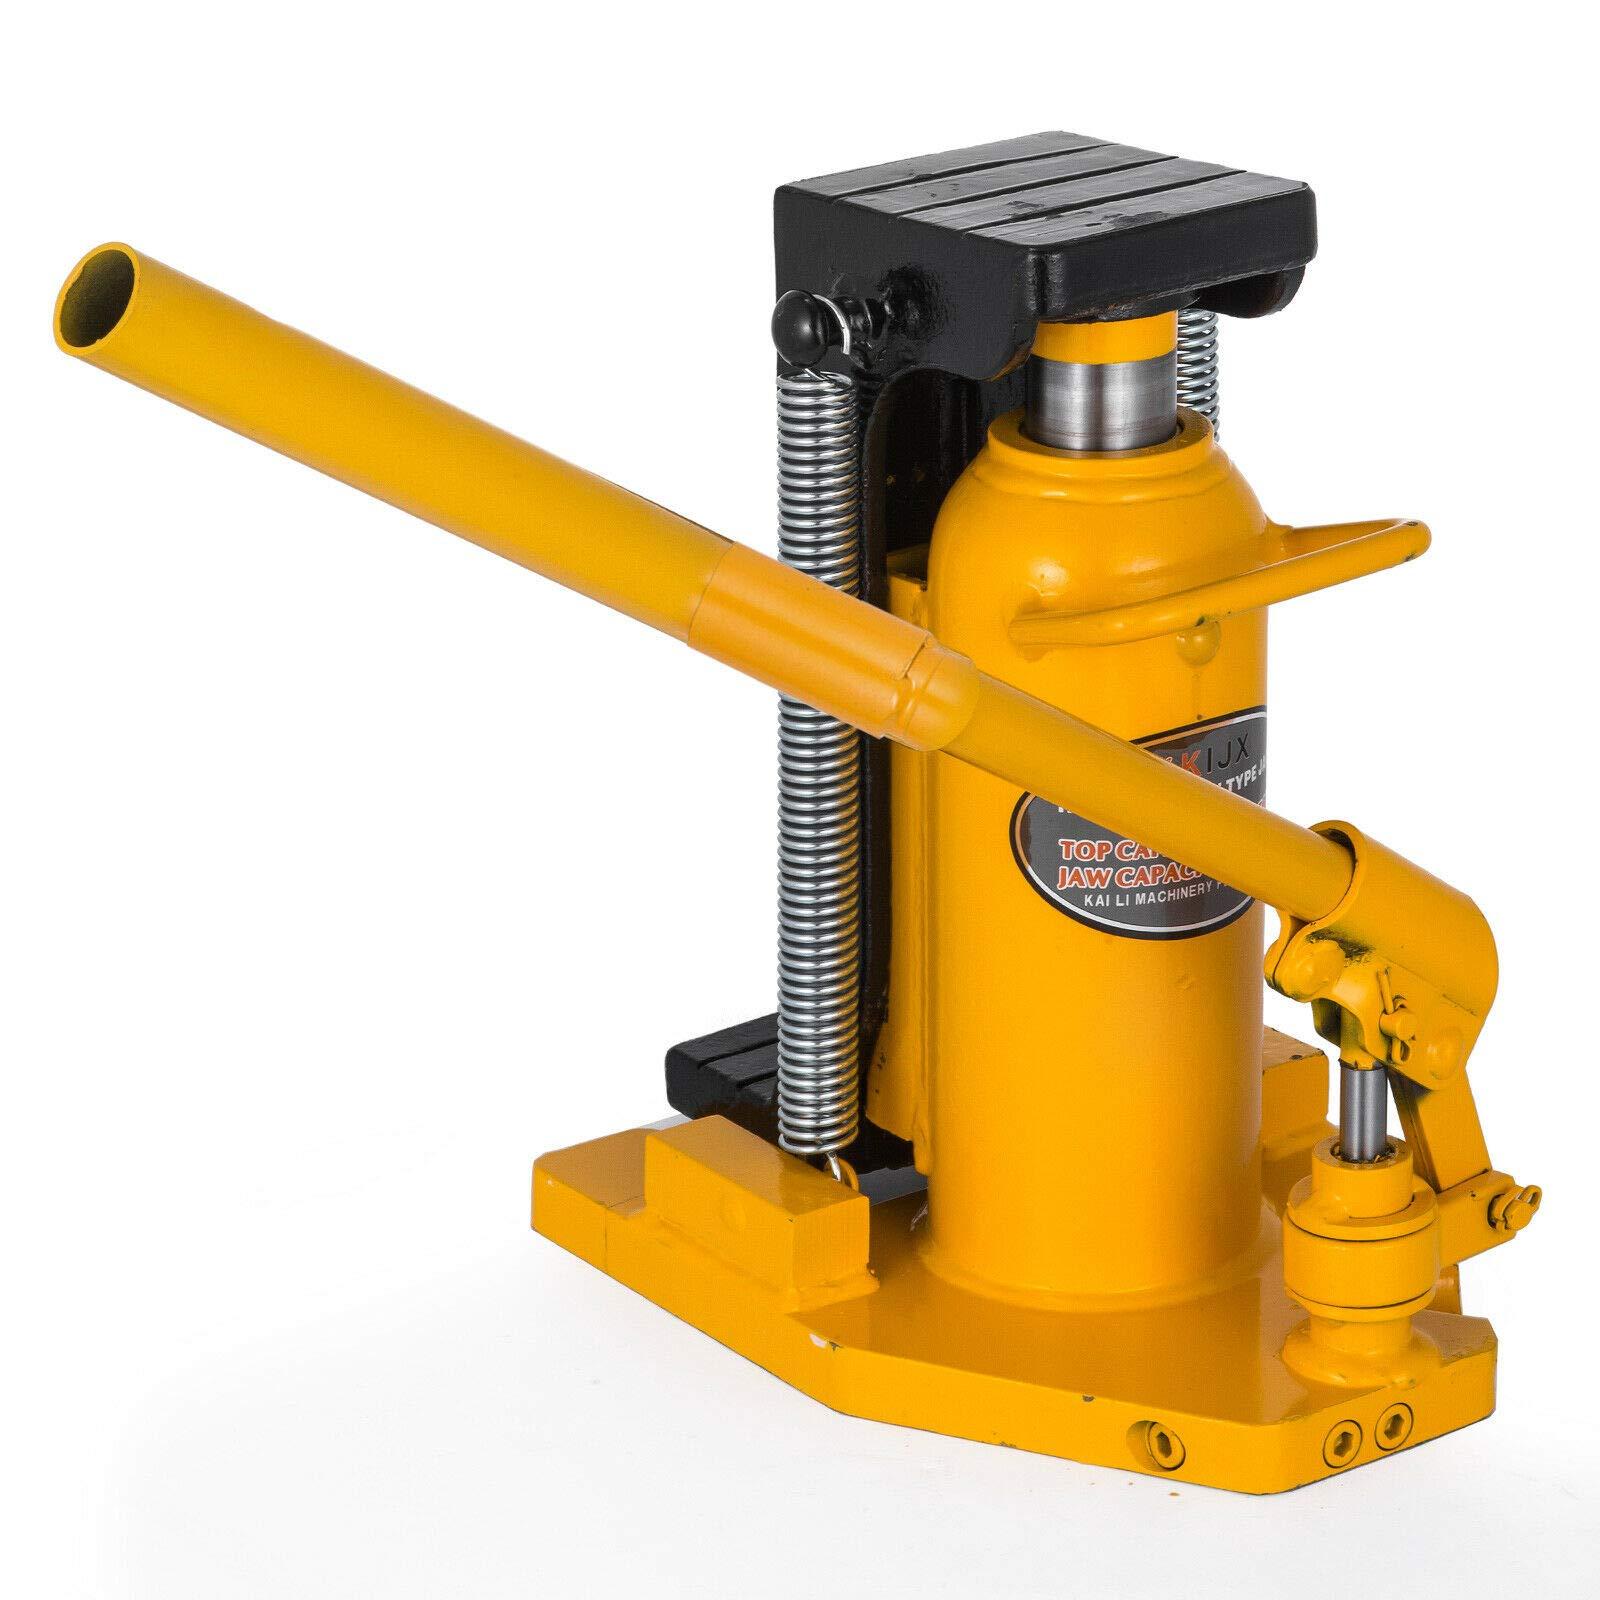 20 Ton Hydraulic Toe Jack Machine Lift Cylinder Equipment Proprietary Tools Home Improvement Garage Industrial Work Heavy Duty Steel Lifting Up Holder Welded Steel 13.7''12.5'' 9.8''